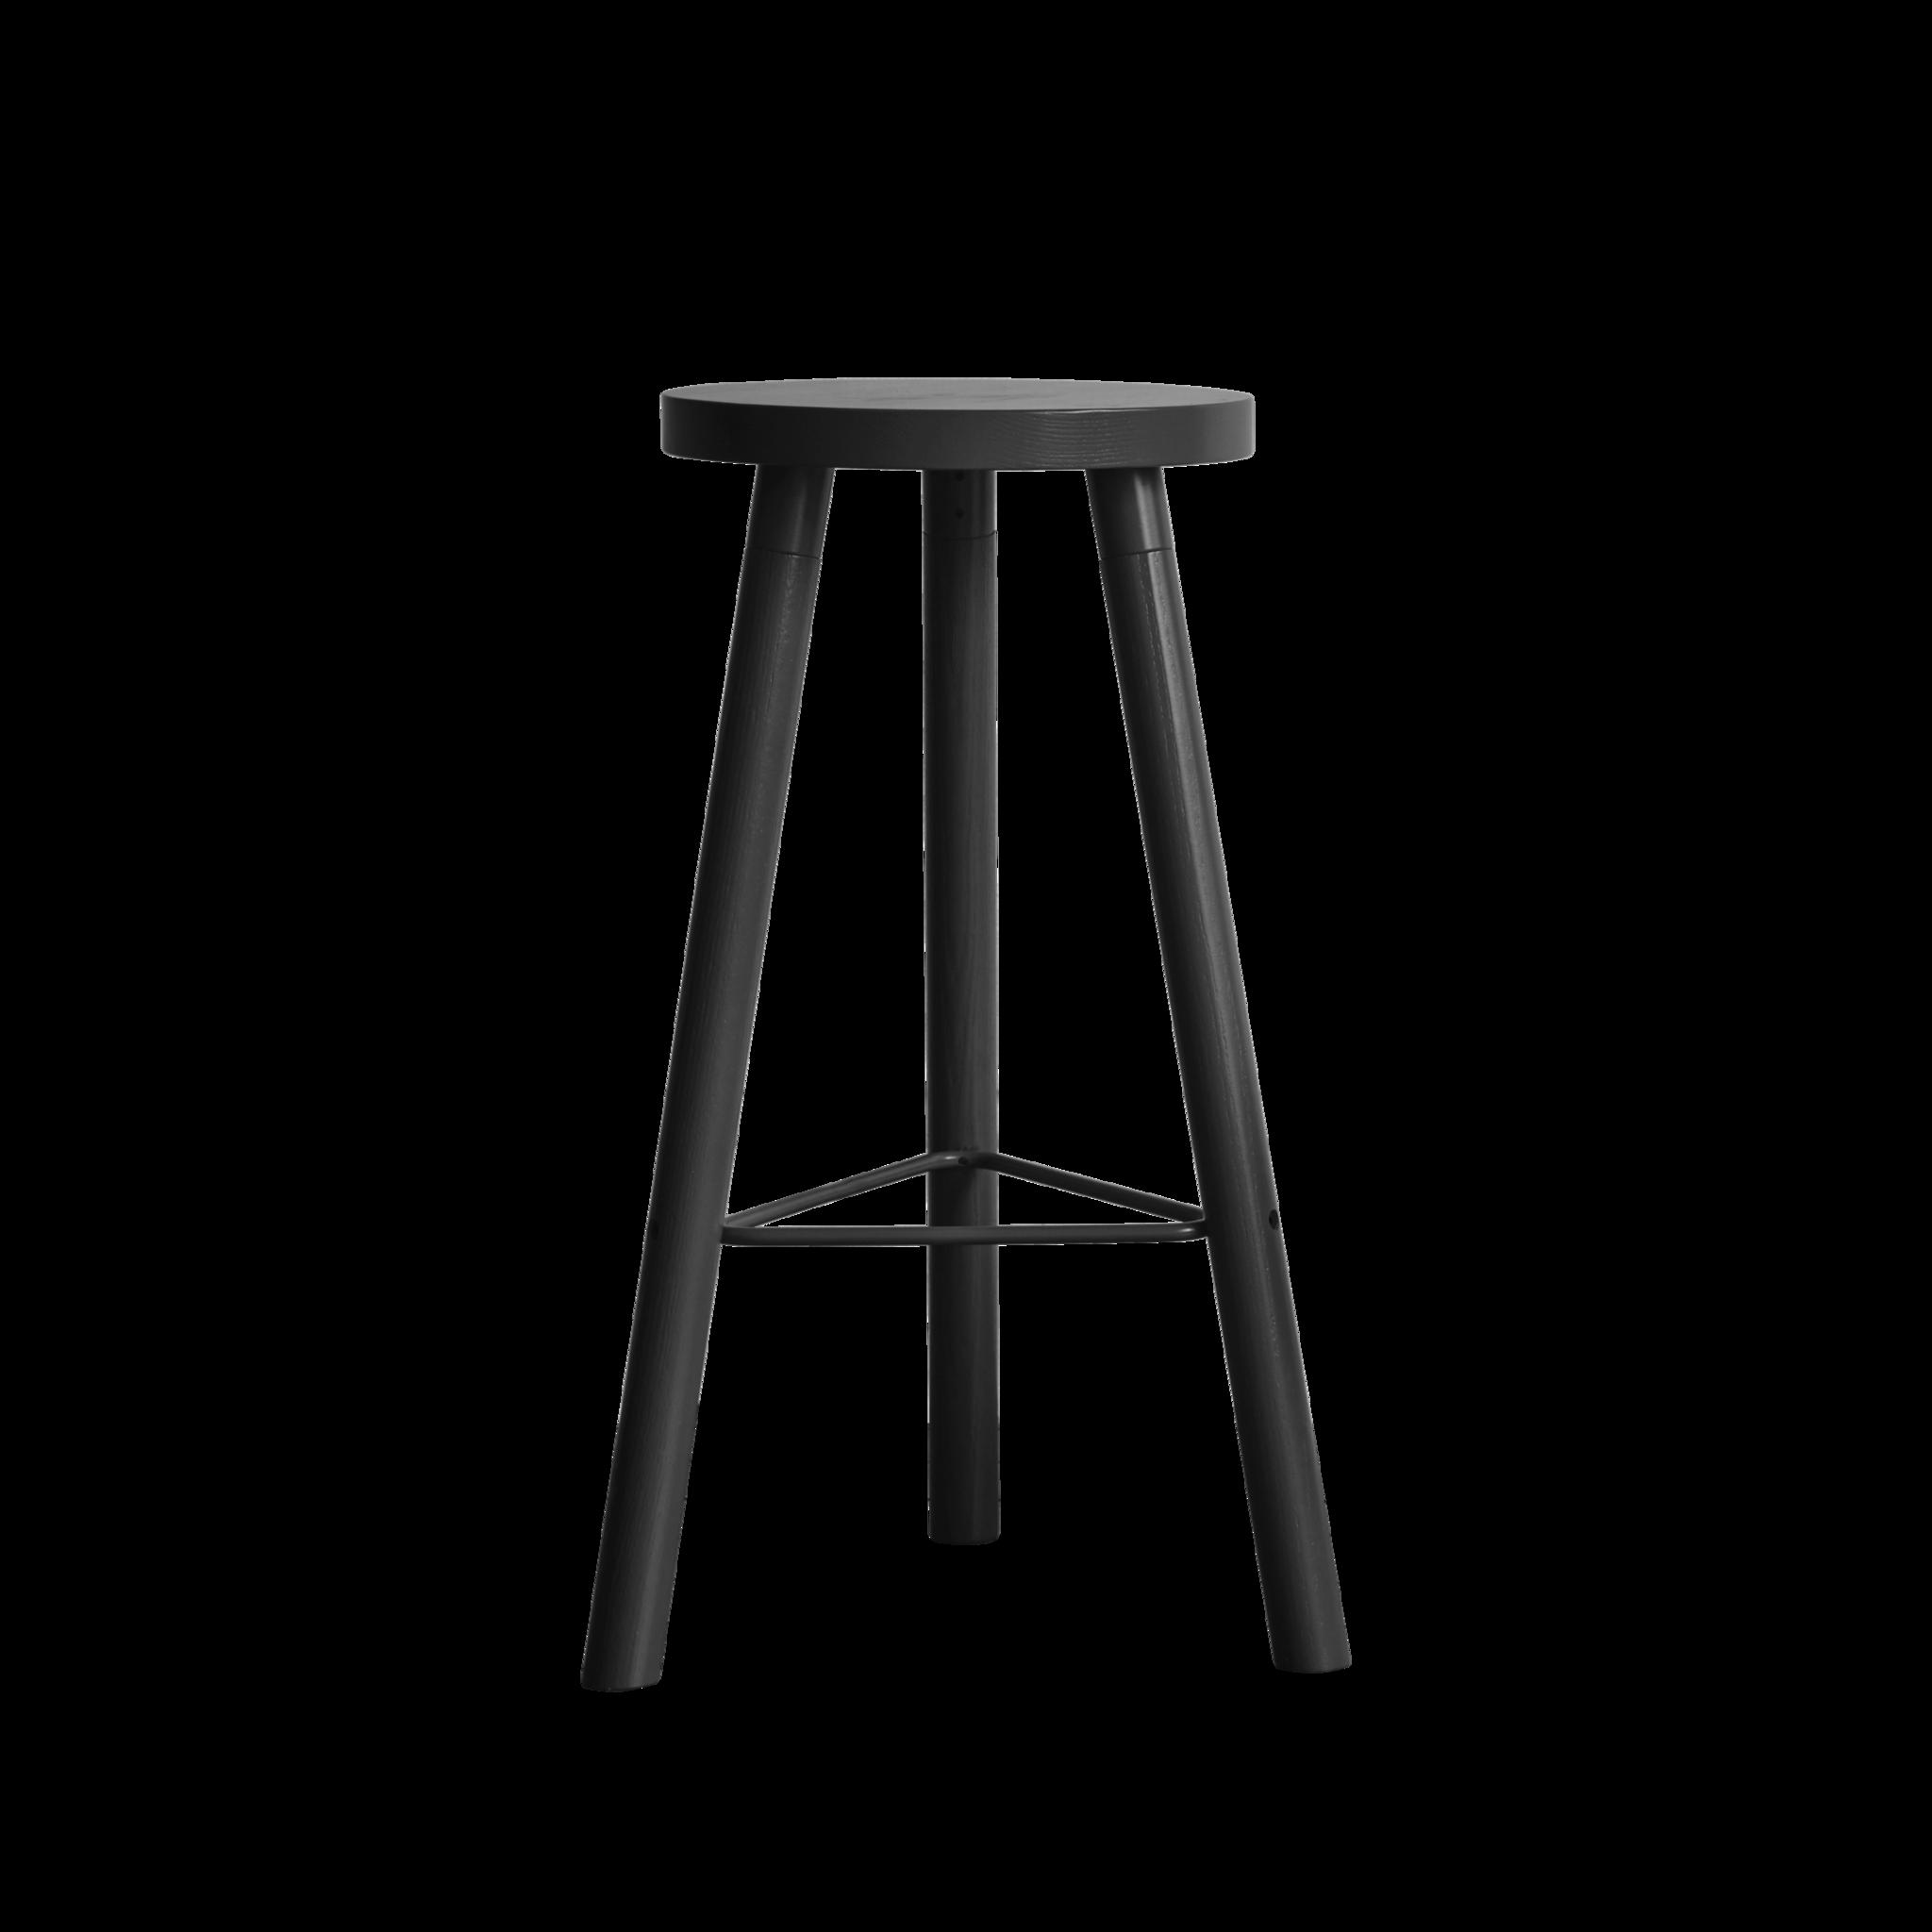 Remarkable Partridge Bar Stool Colour Block Bar Stools Black Bar Inzonedesignstudio Interior Chair Design Inzonedesignstudiocom